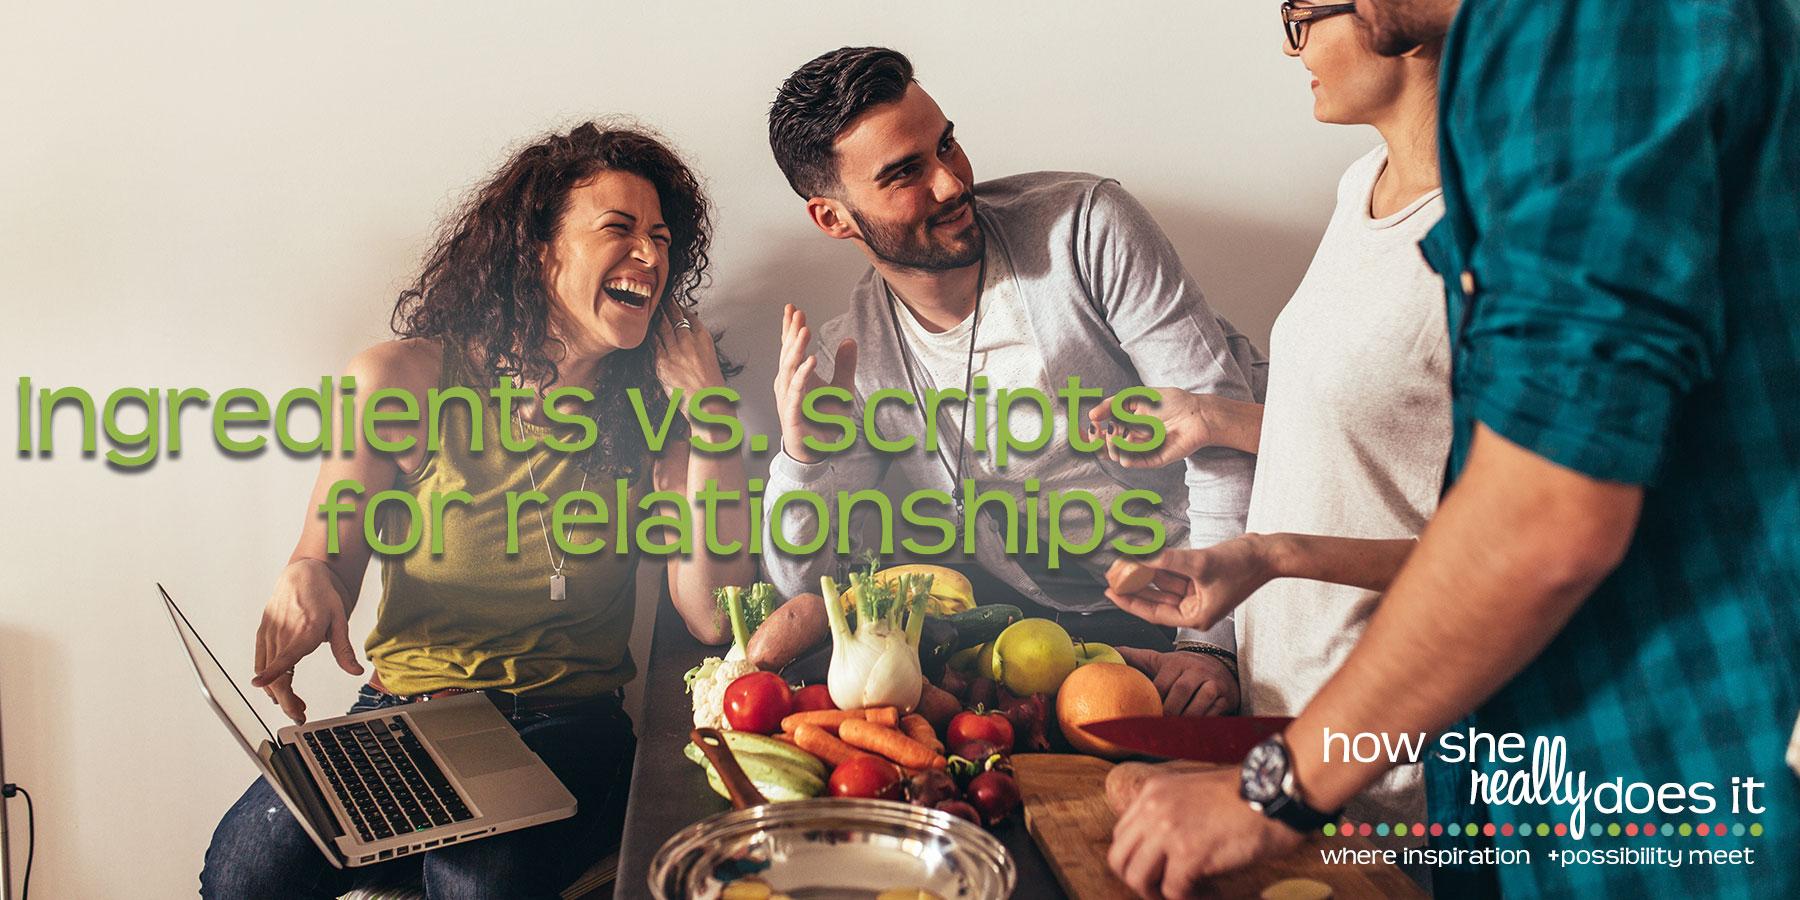 Ingredients vs. scripts for relationships